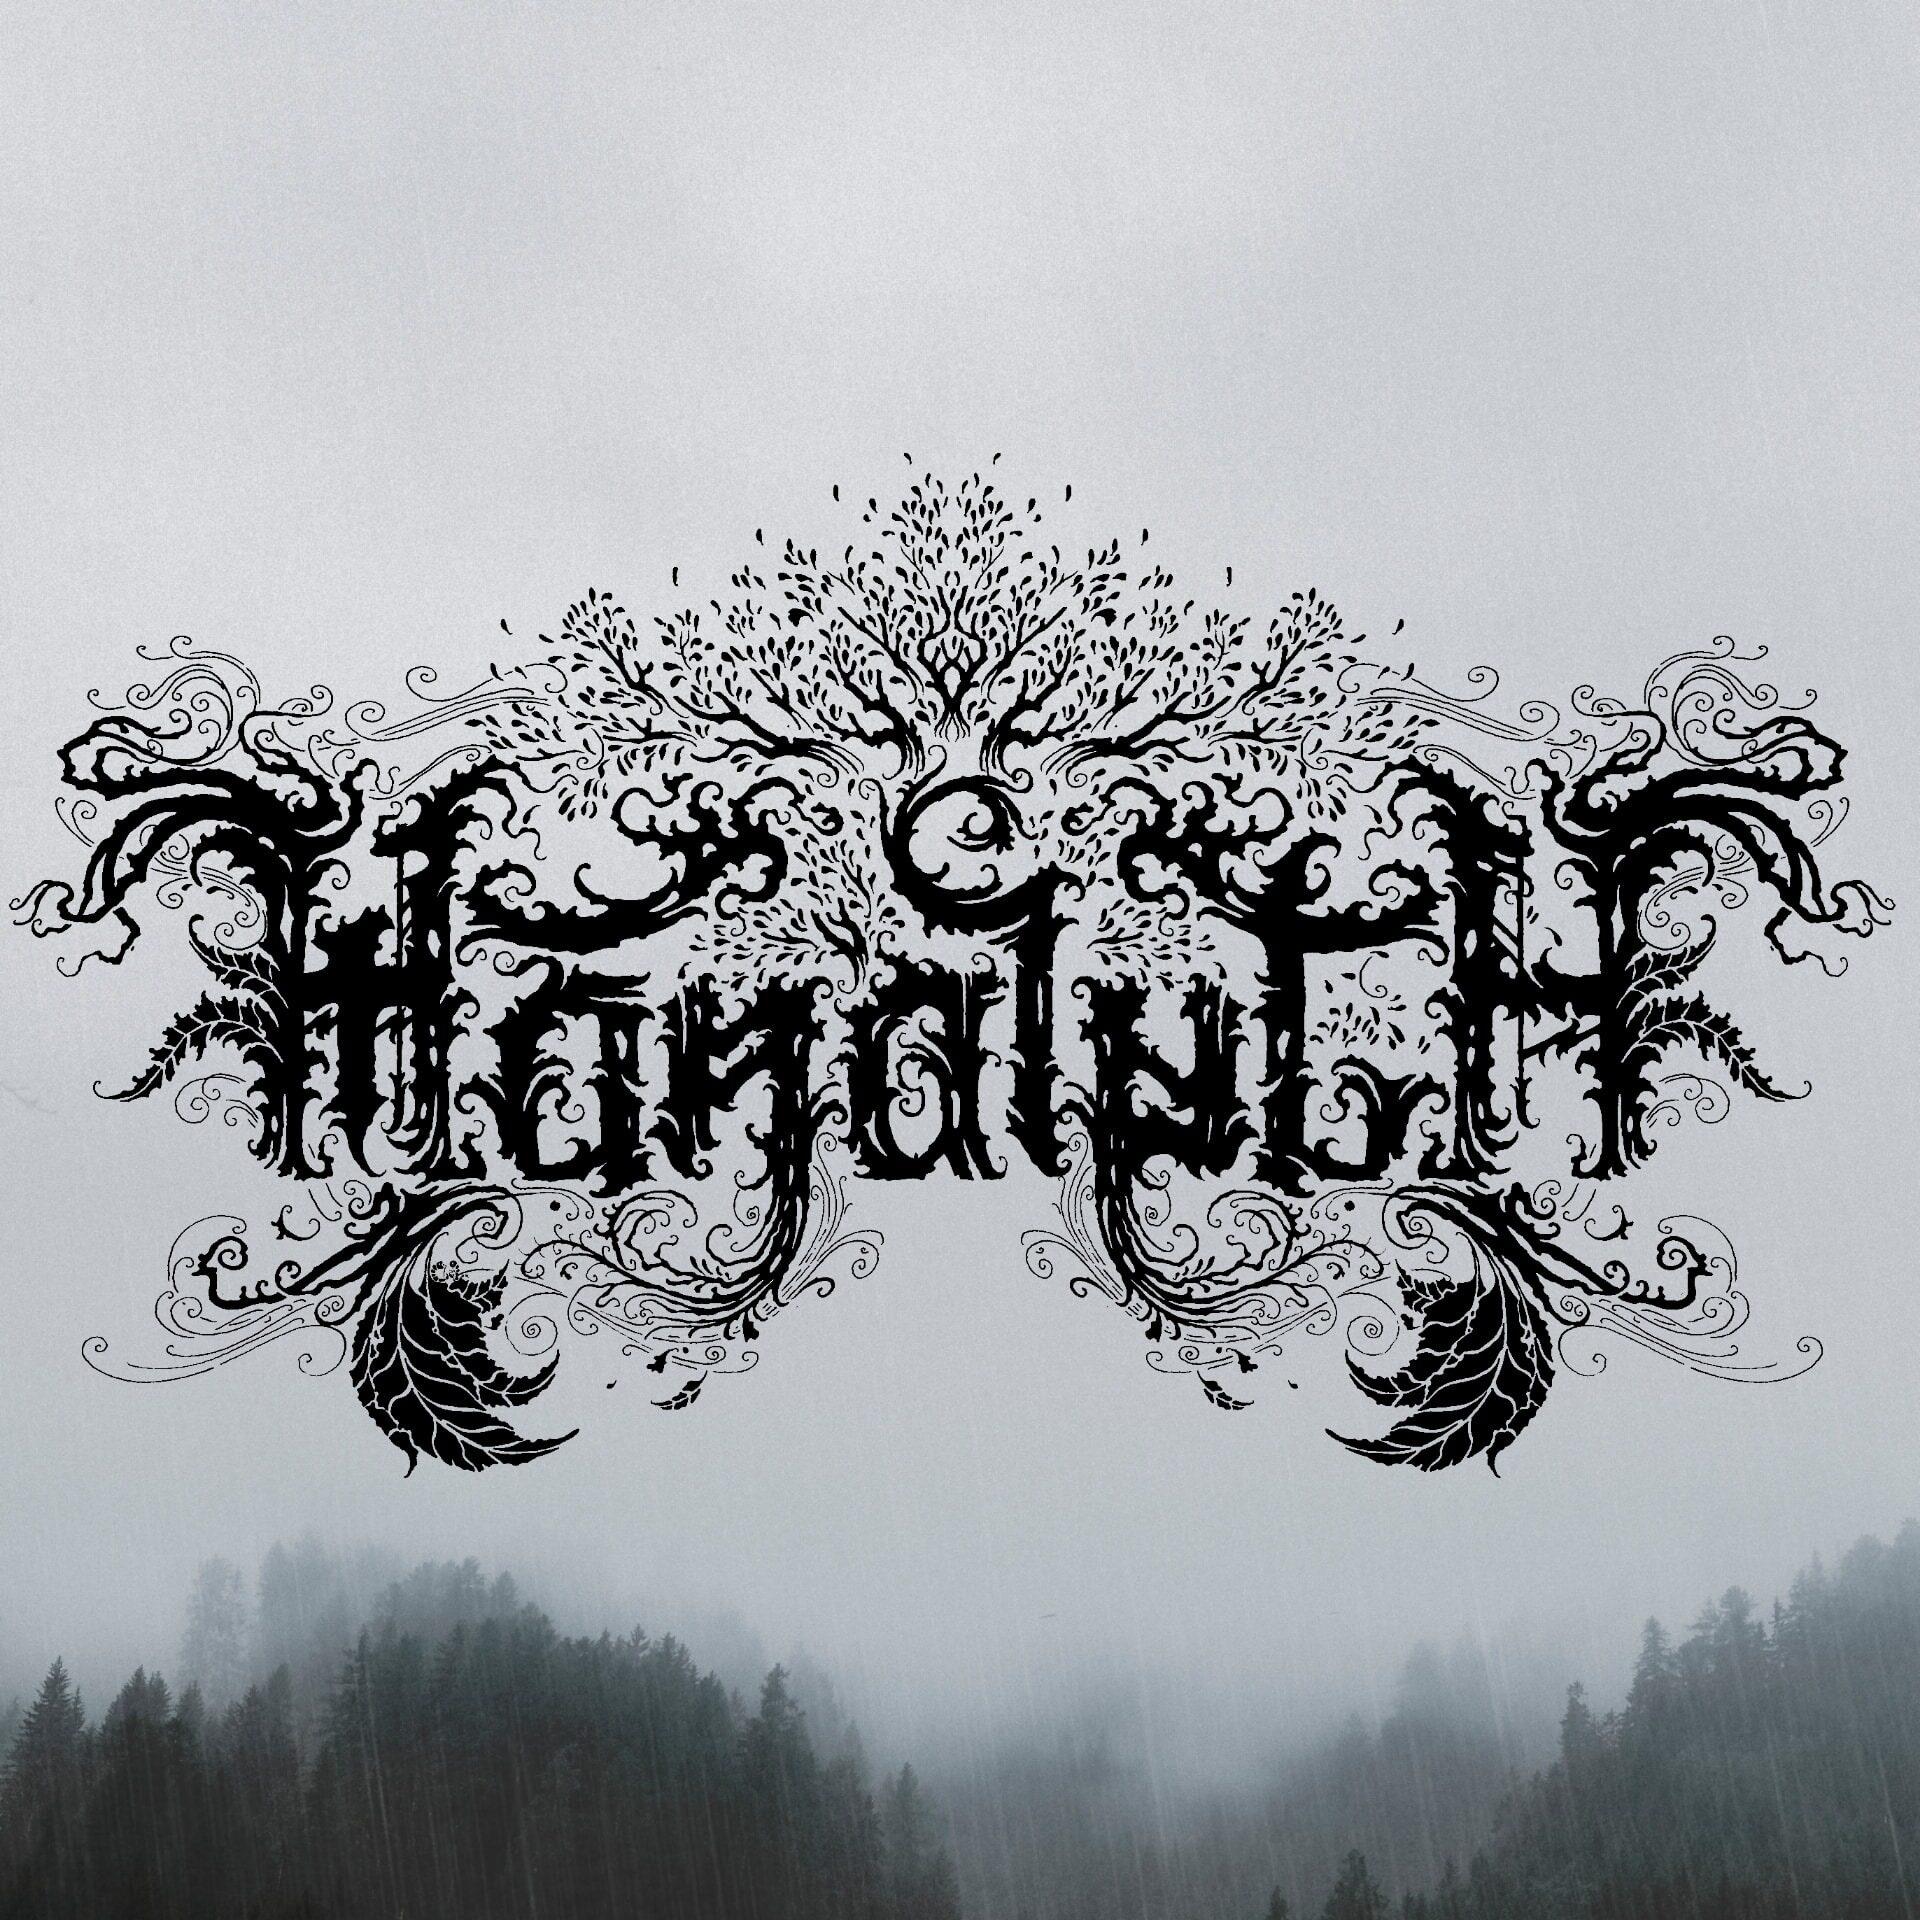 Manalyth